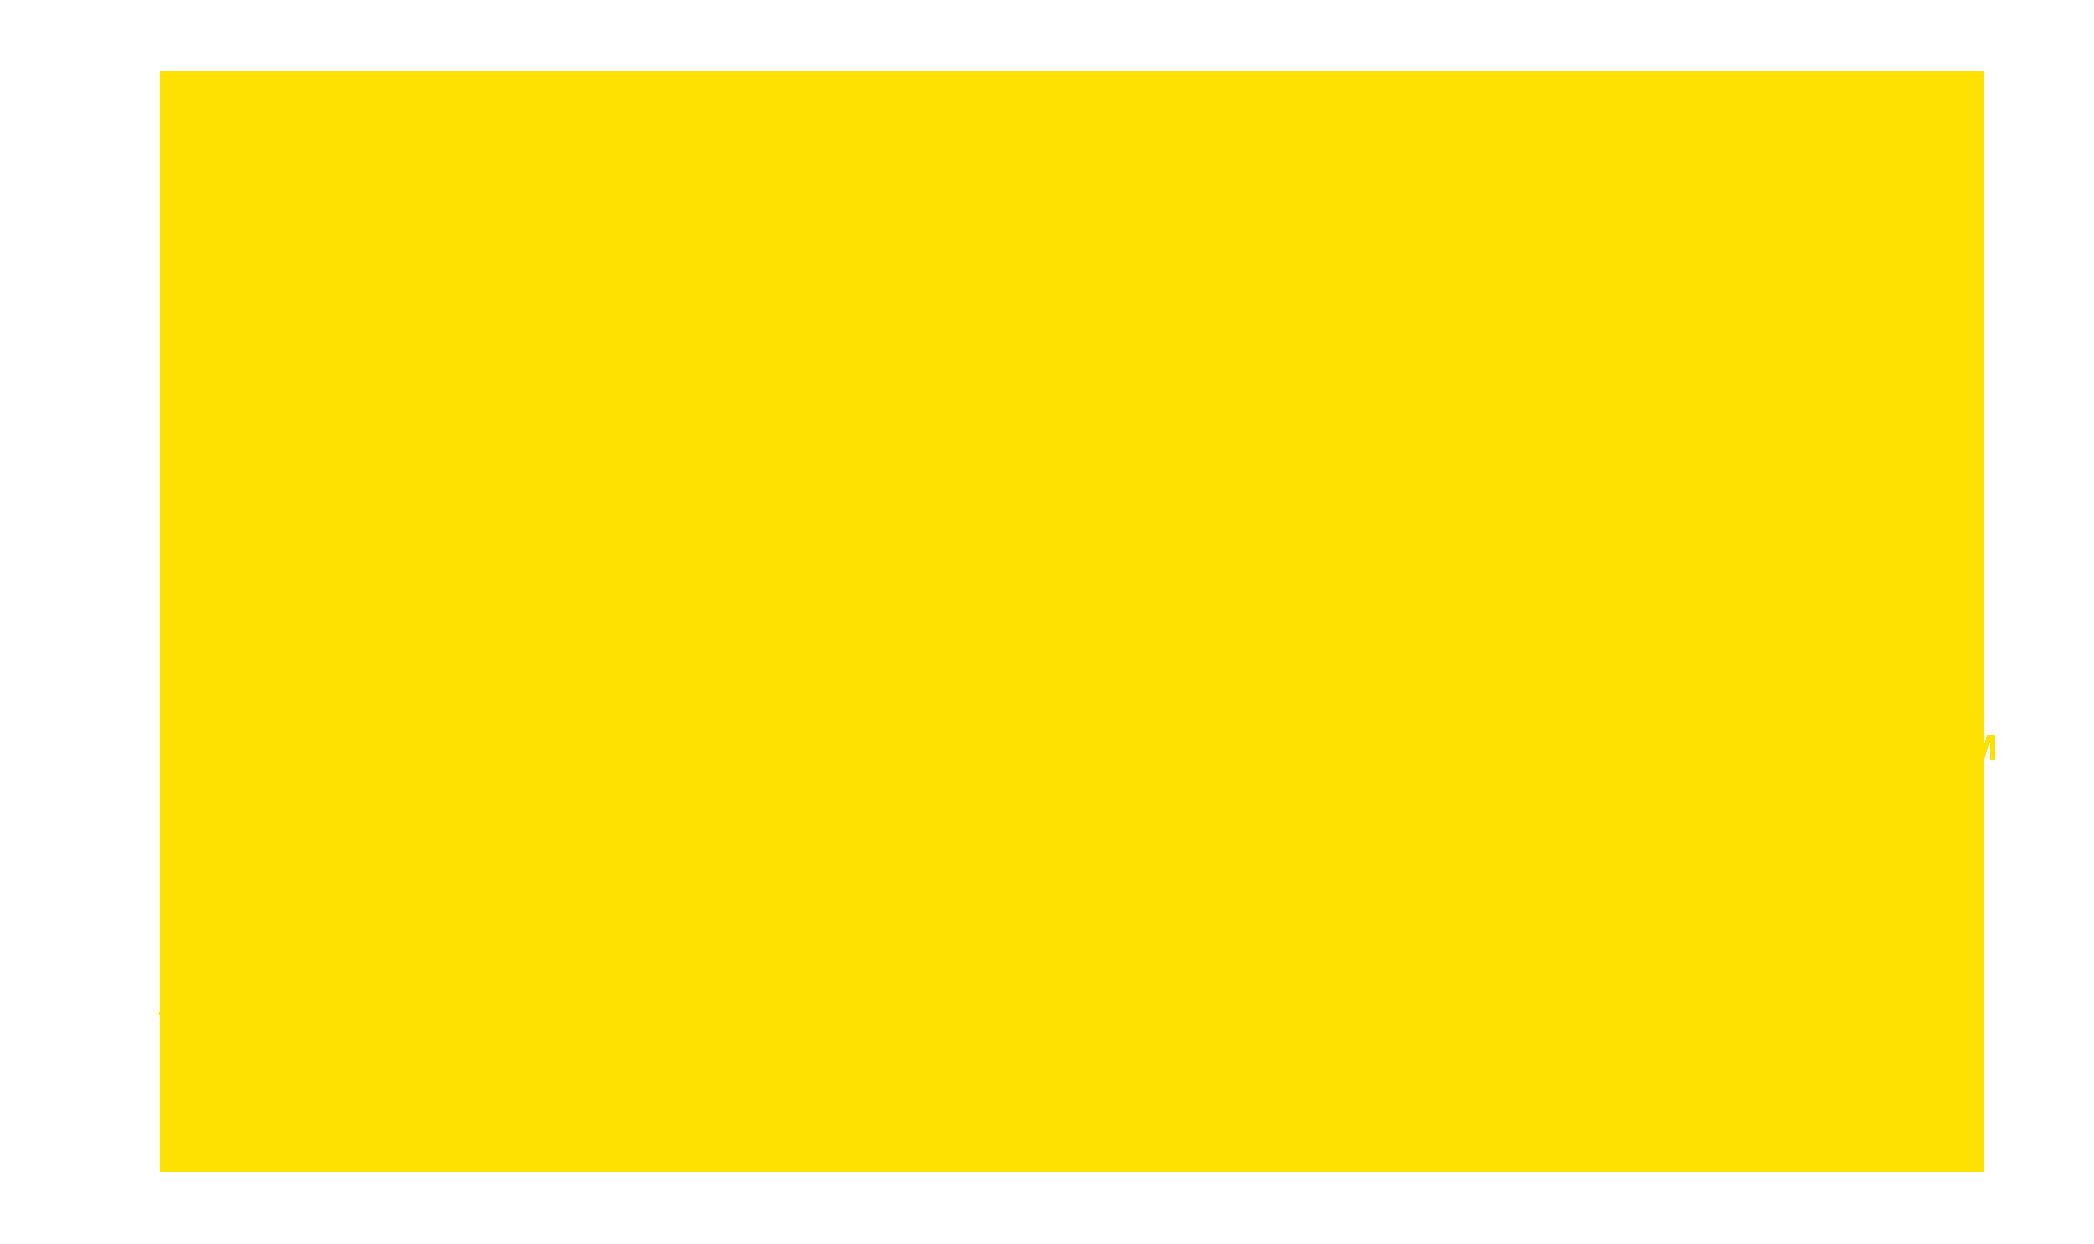 Spikeball Net Full Logo Yellow.png